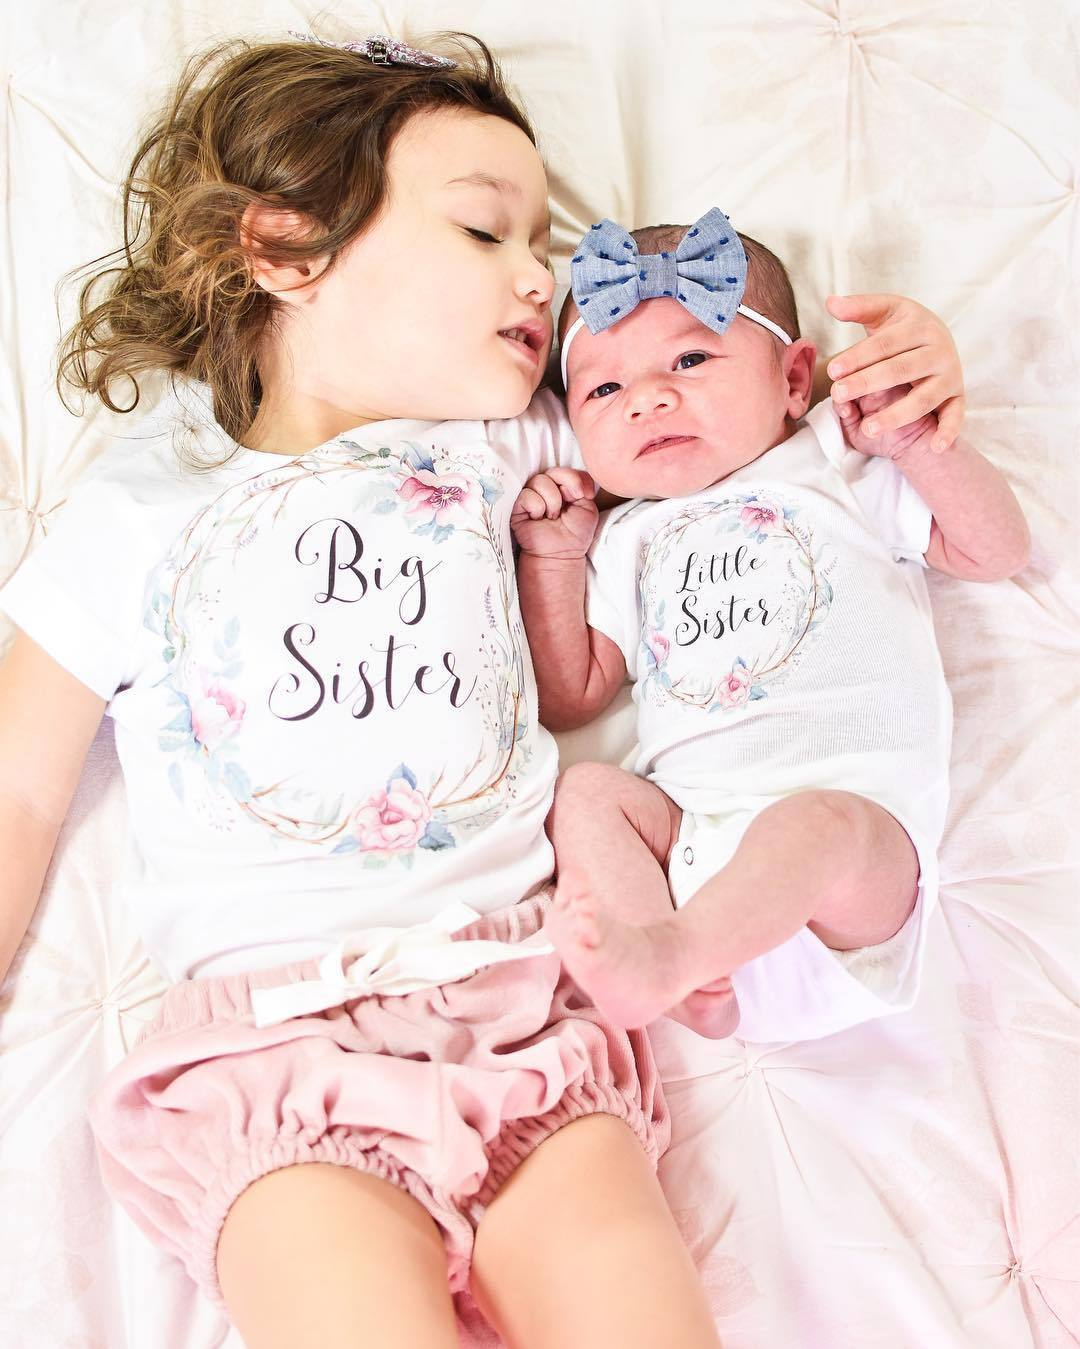 summer-baby-girls-romper-t-shirt-2017-summer-short-sleeve-cotton-little-sister-romper-big-sister-t-shirt-outfit